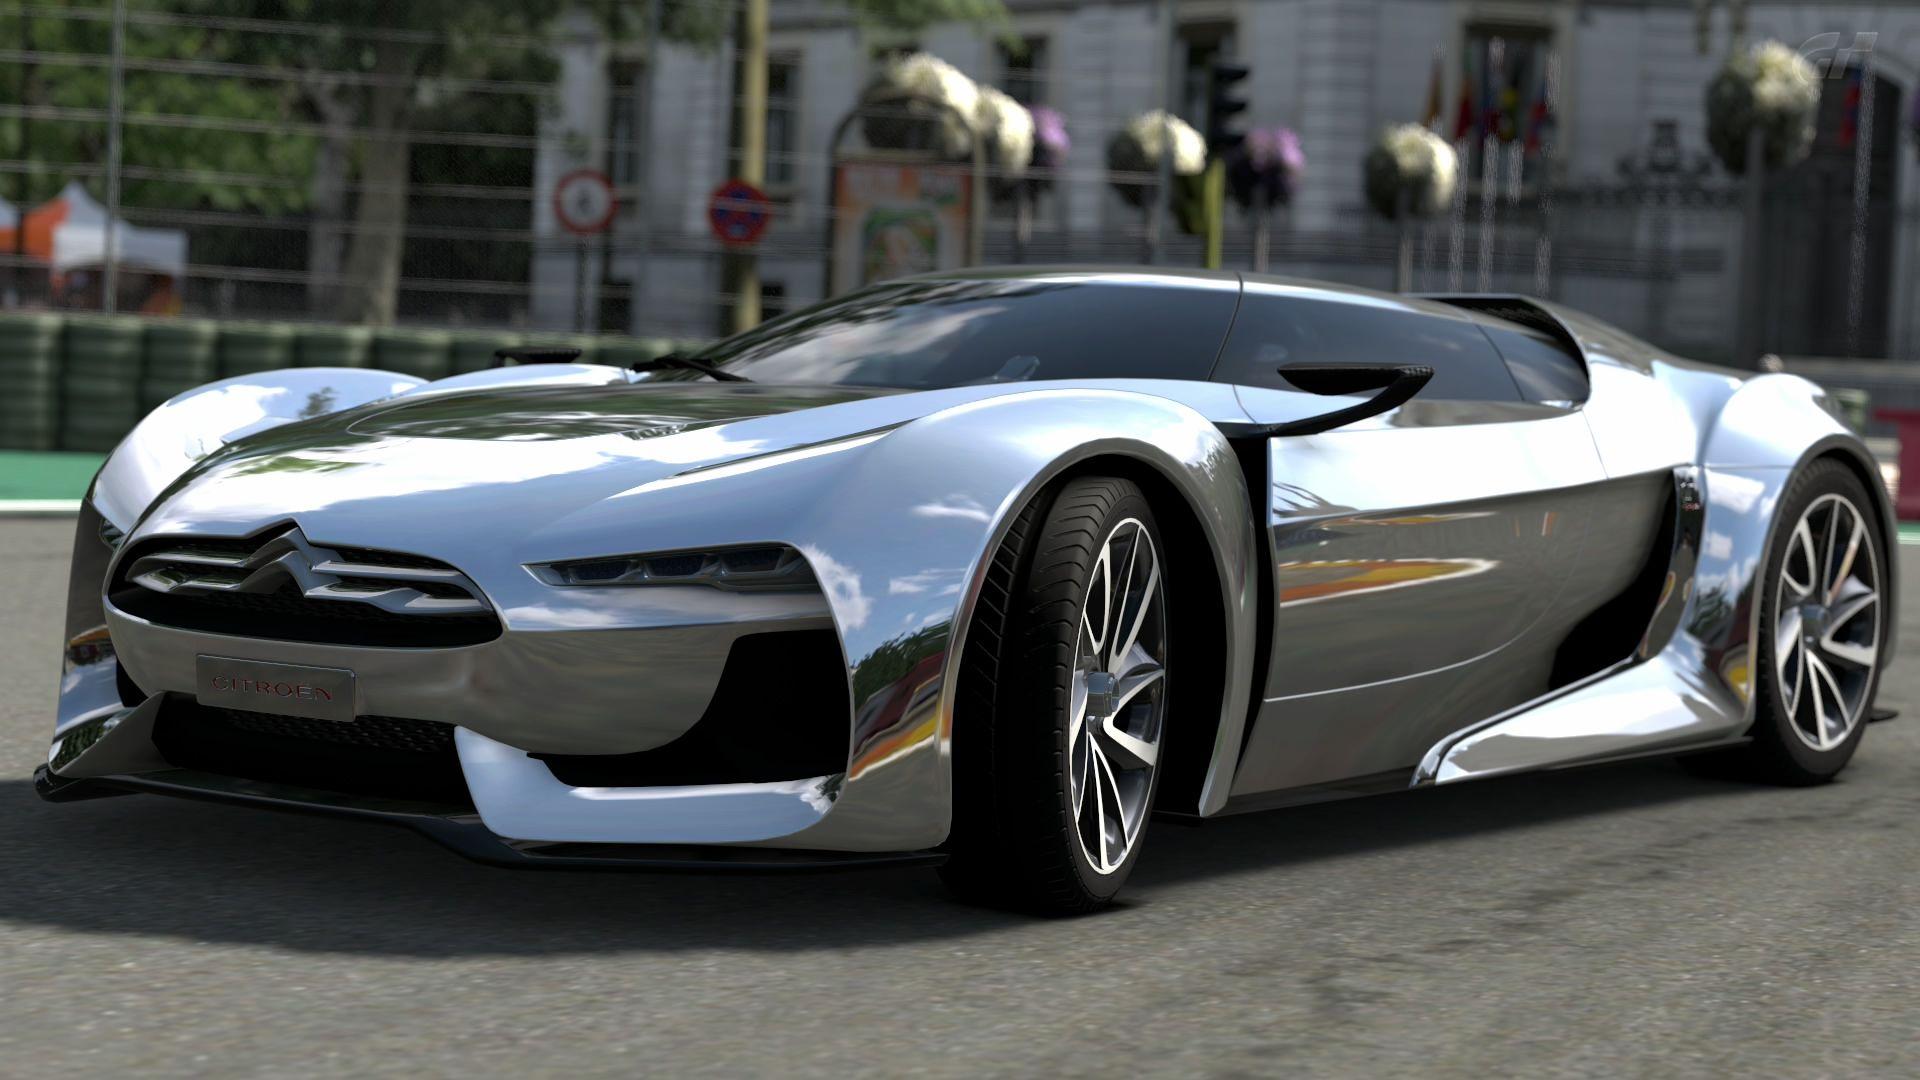 citroen gt road car cars pinterest cars vehicle and dream cars. Black Bedroom Furniture Sets. Home Design Ideas